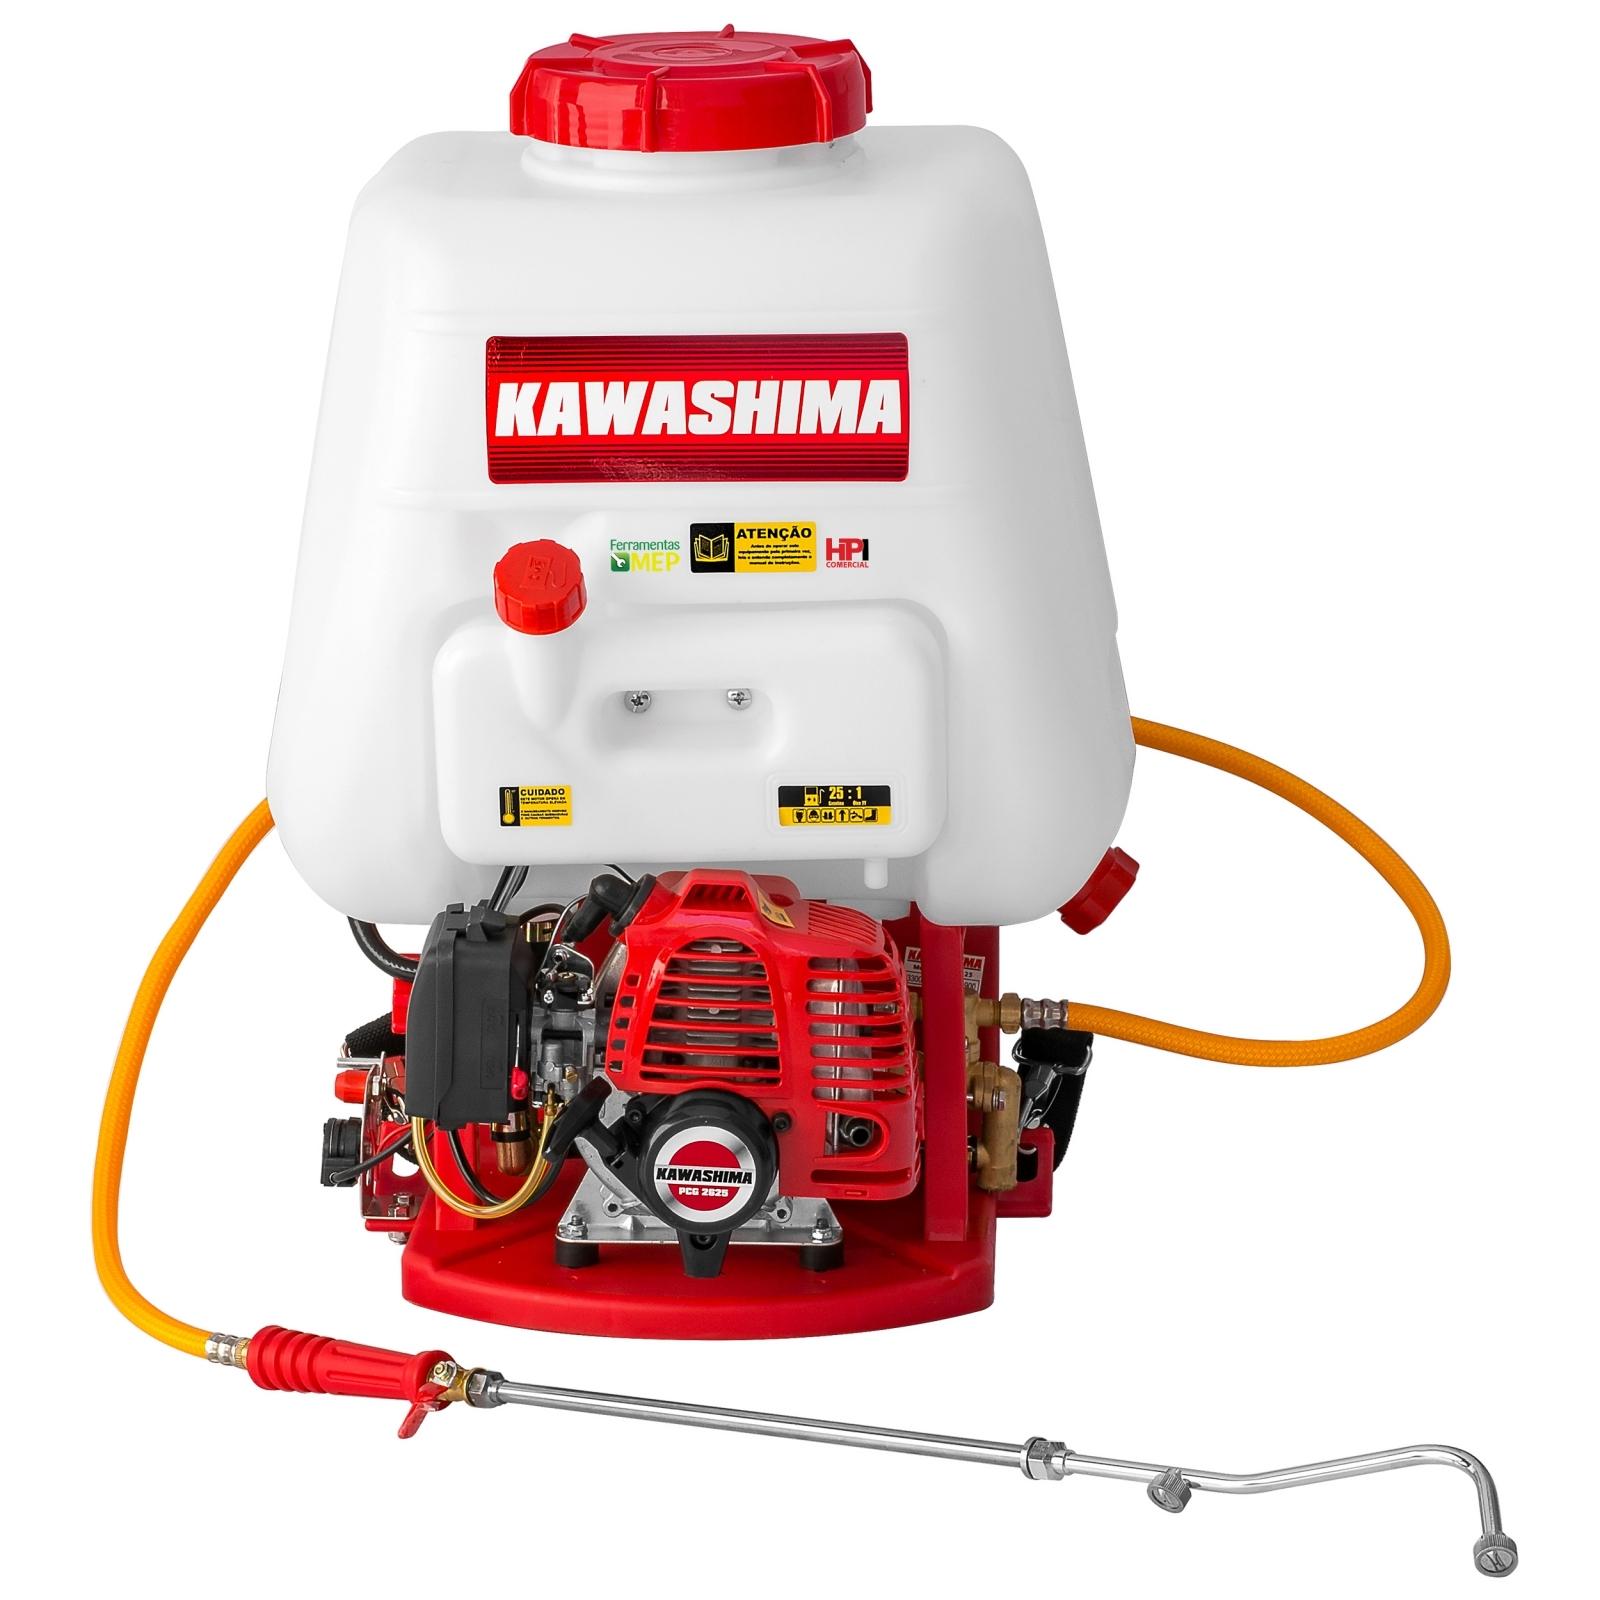 Pulverizador Costal A Gasolina Kawashima - PCG 2625 - Ferramentas MEP